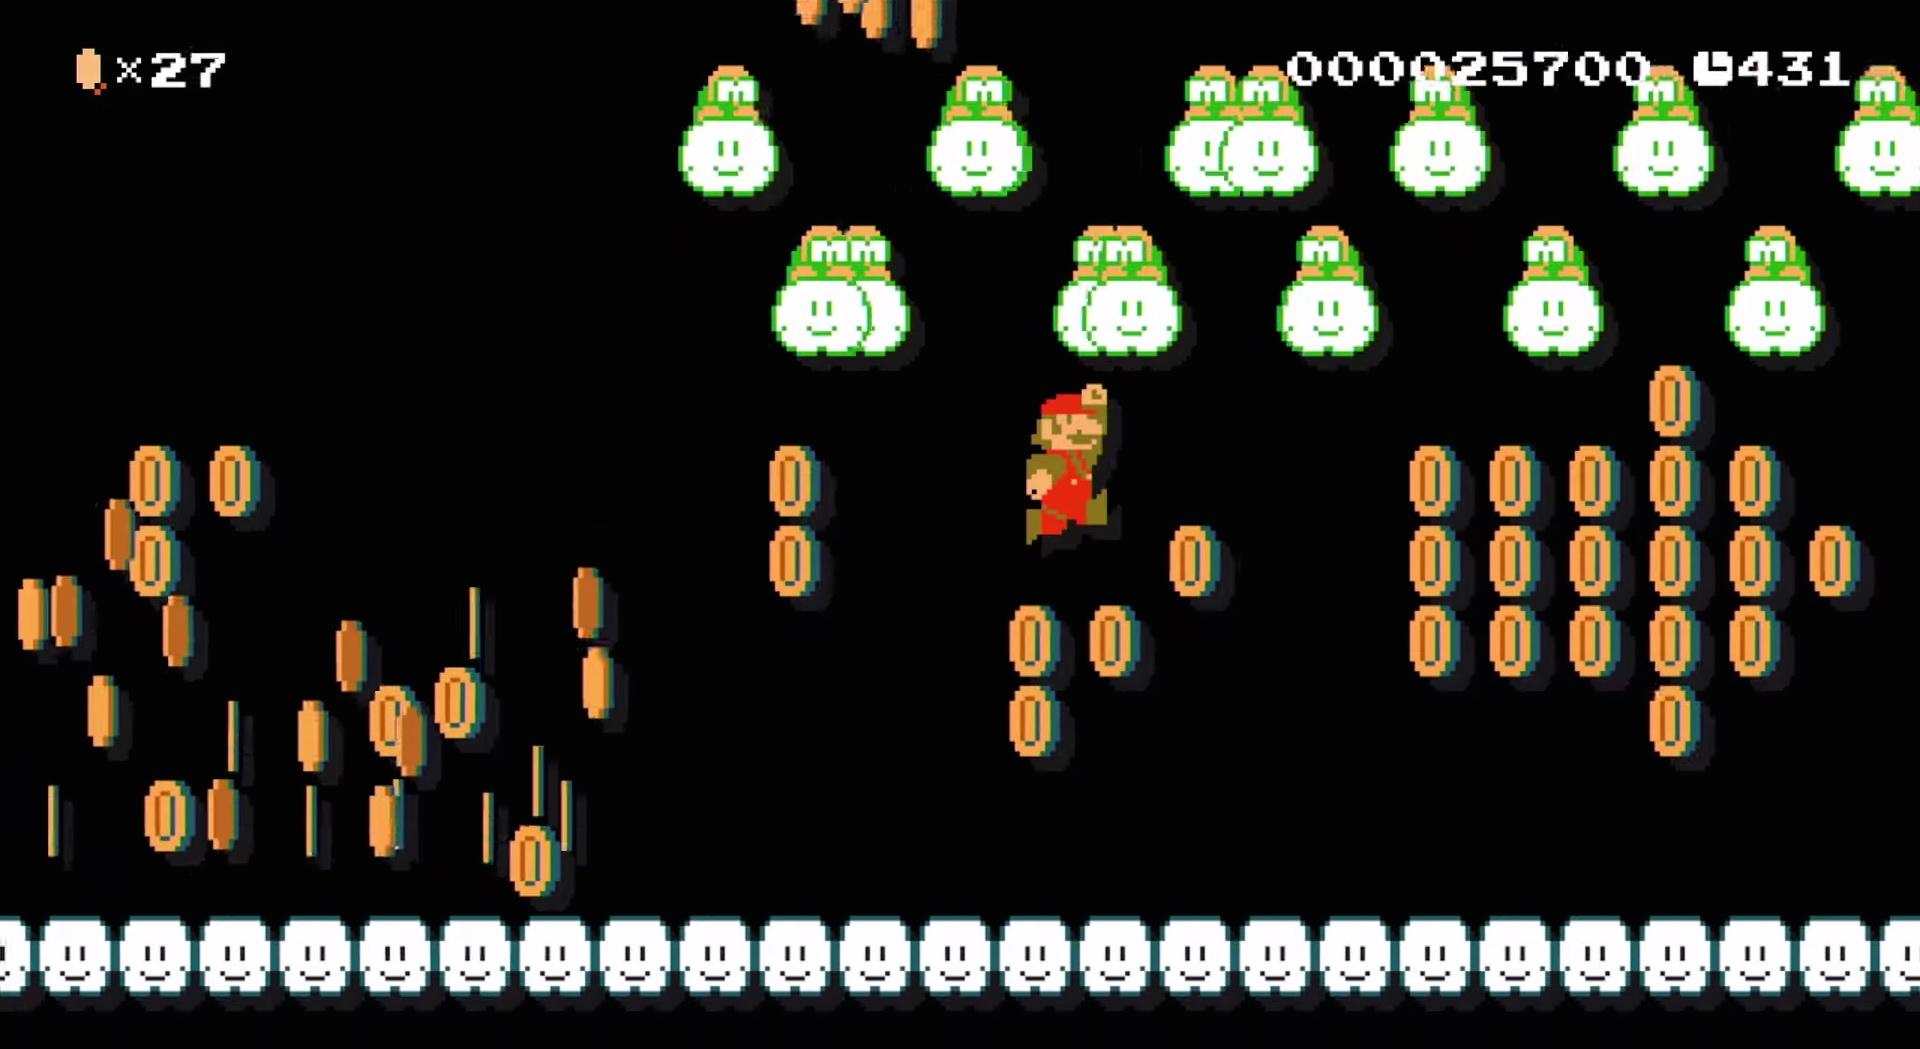 Super Mario Maker - zbieranie monet